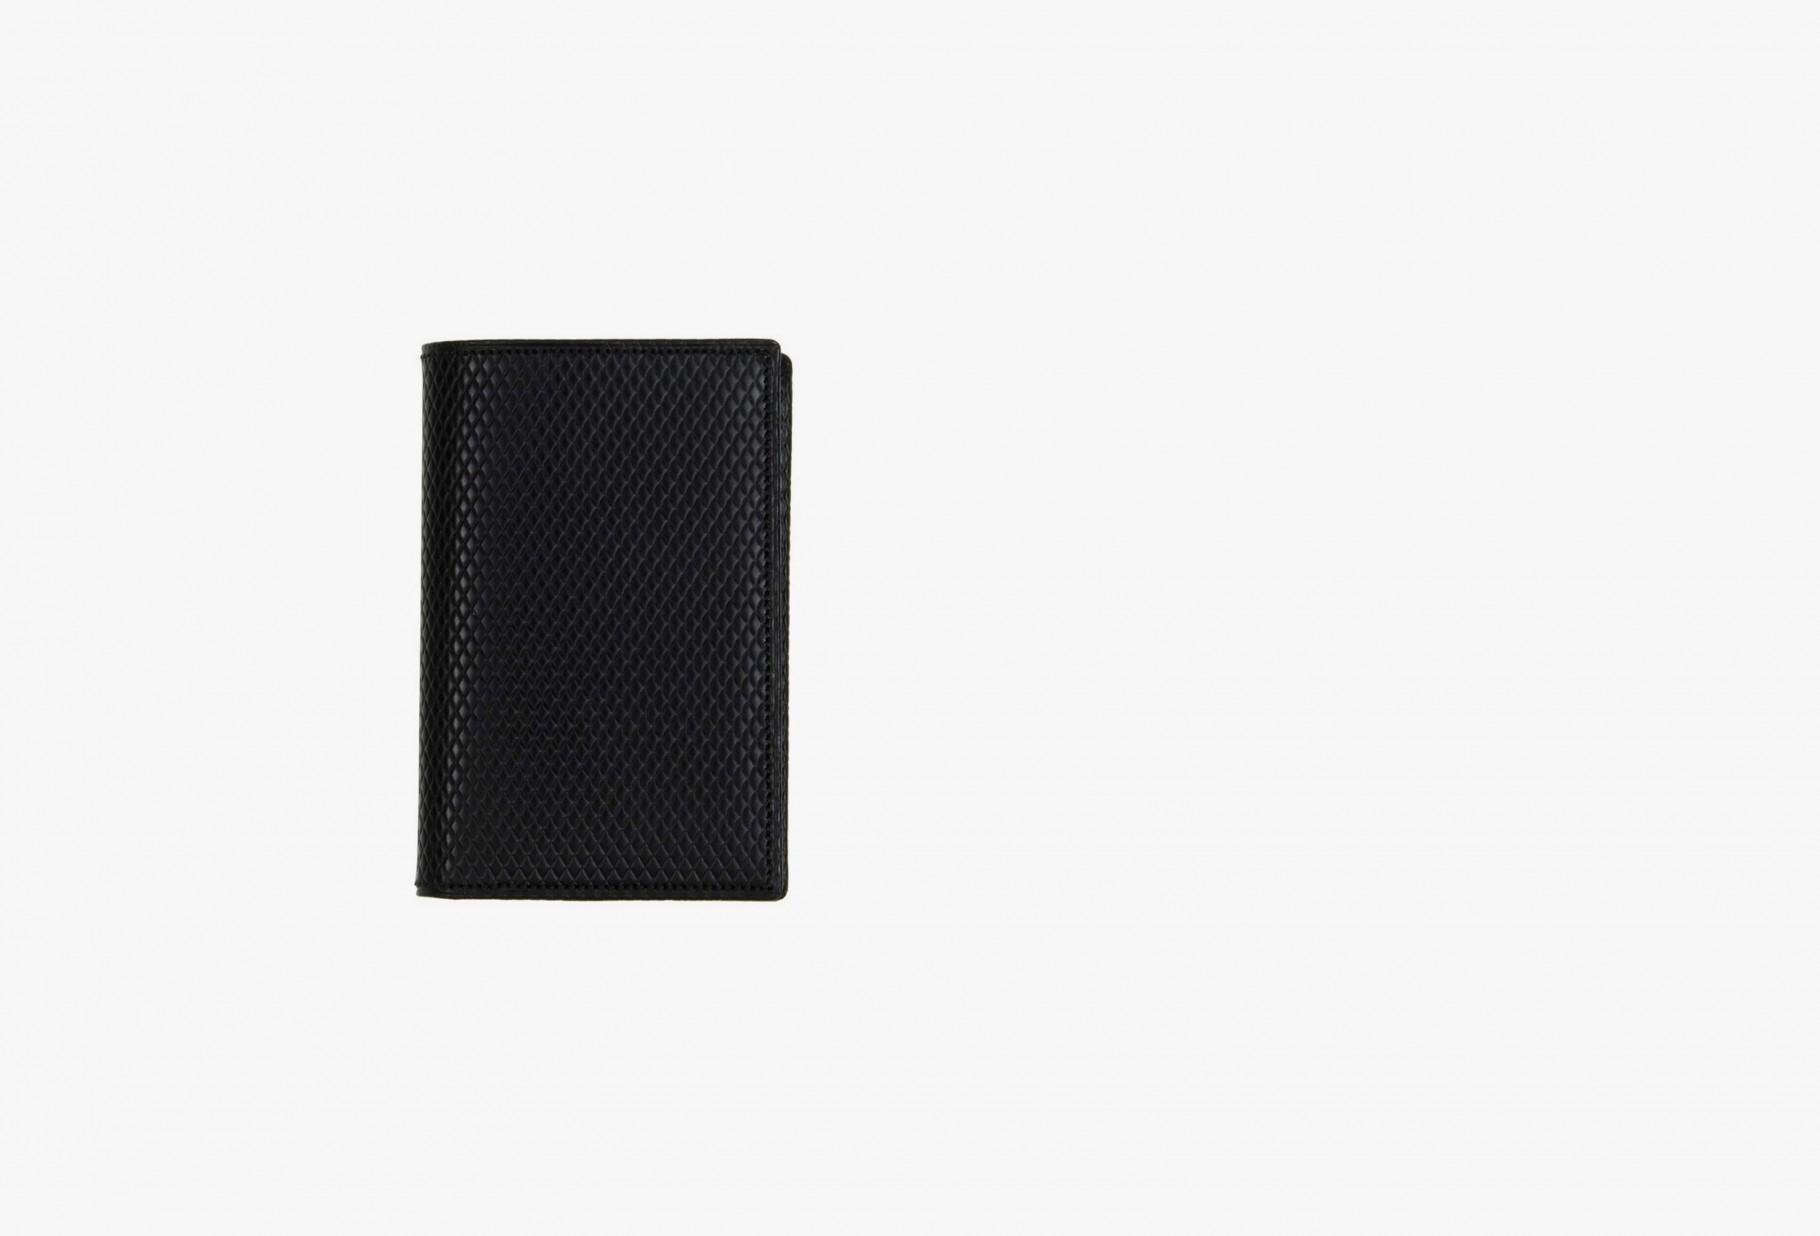 COMME DES GARÇONS WALLETS / Cdg luxury group sa6400lg Black